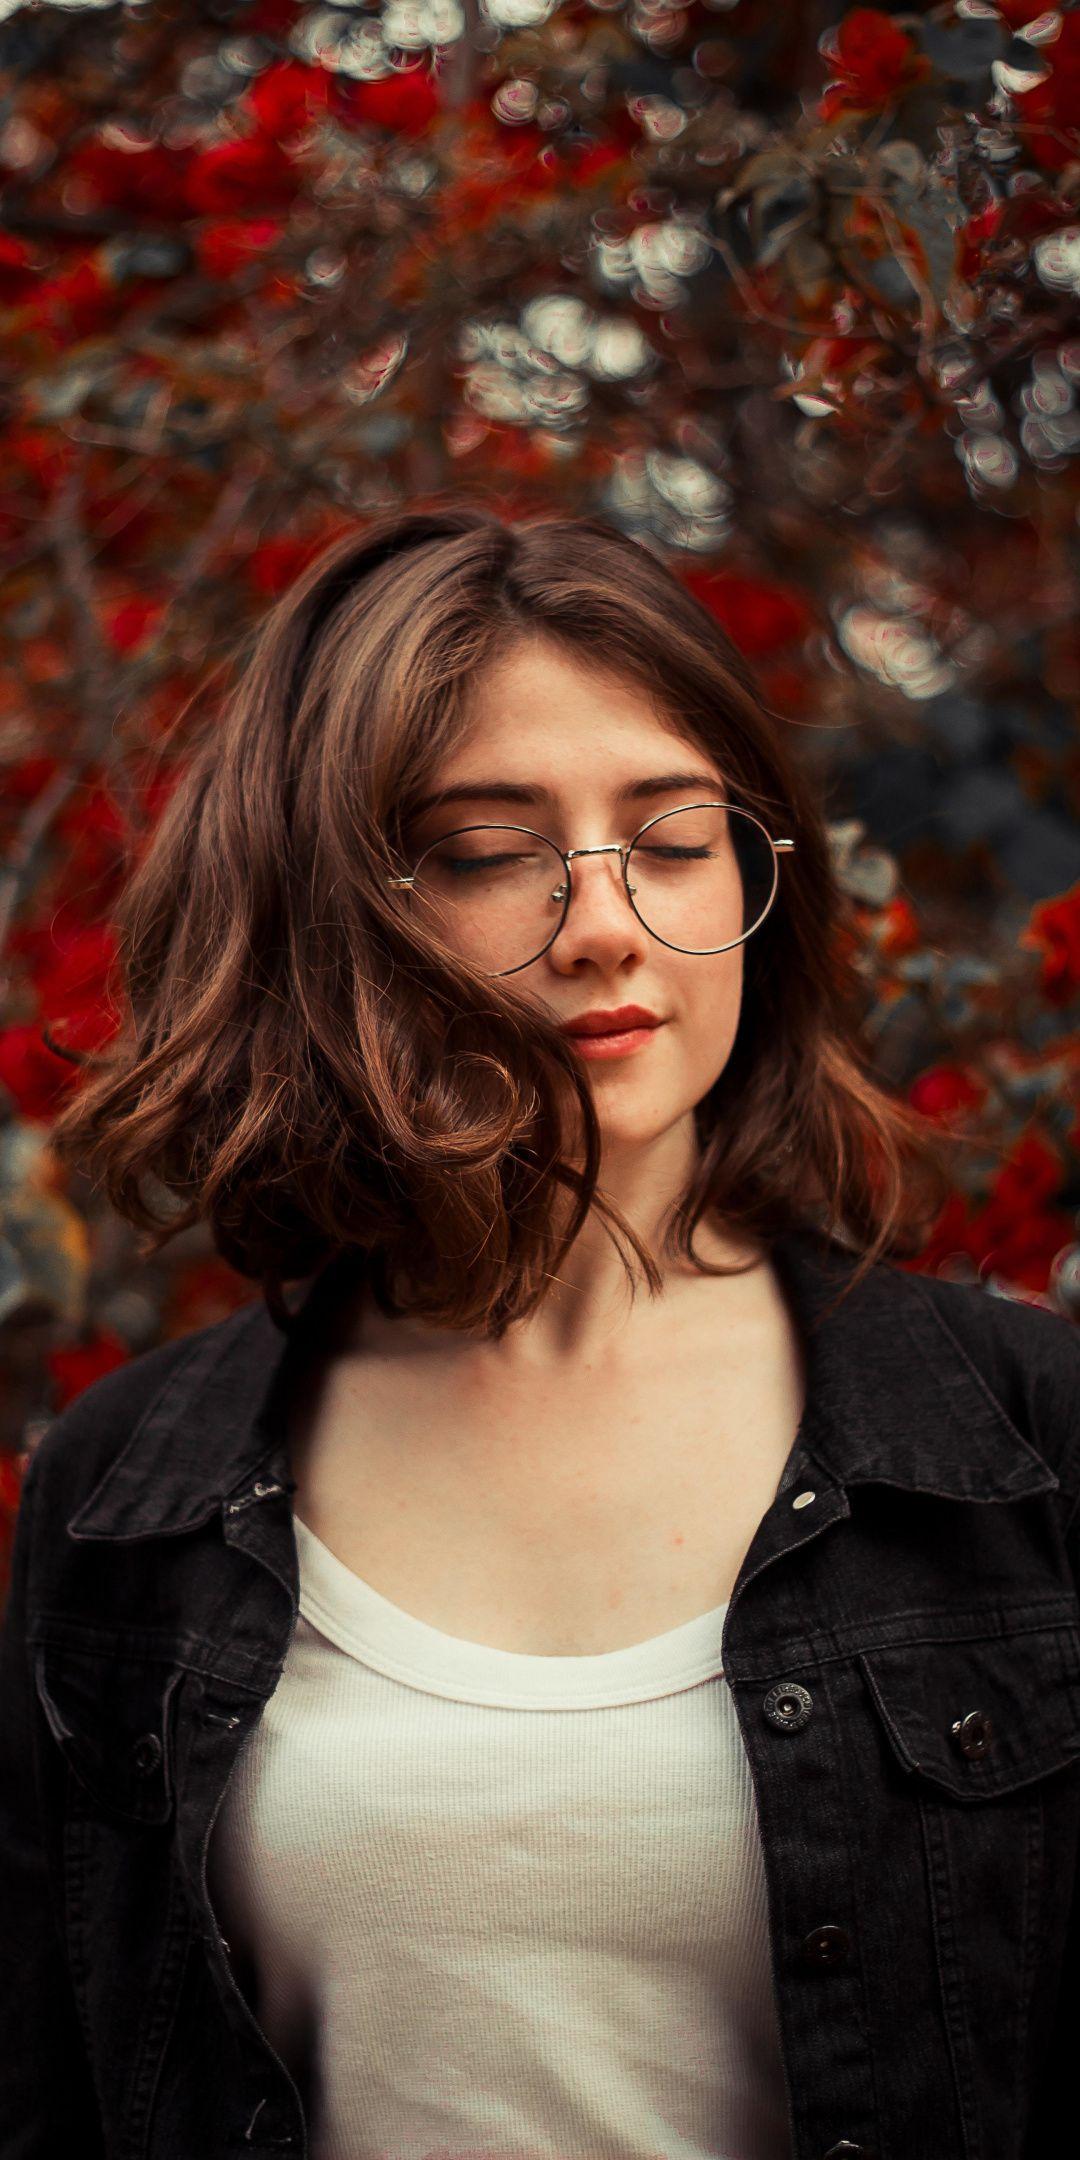 Close Eyes Cute Girl Model 1080x2160 Wallpaper Em 2019